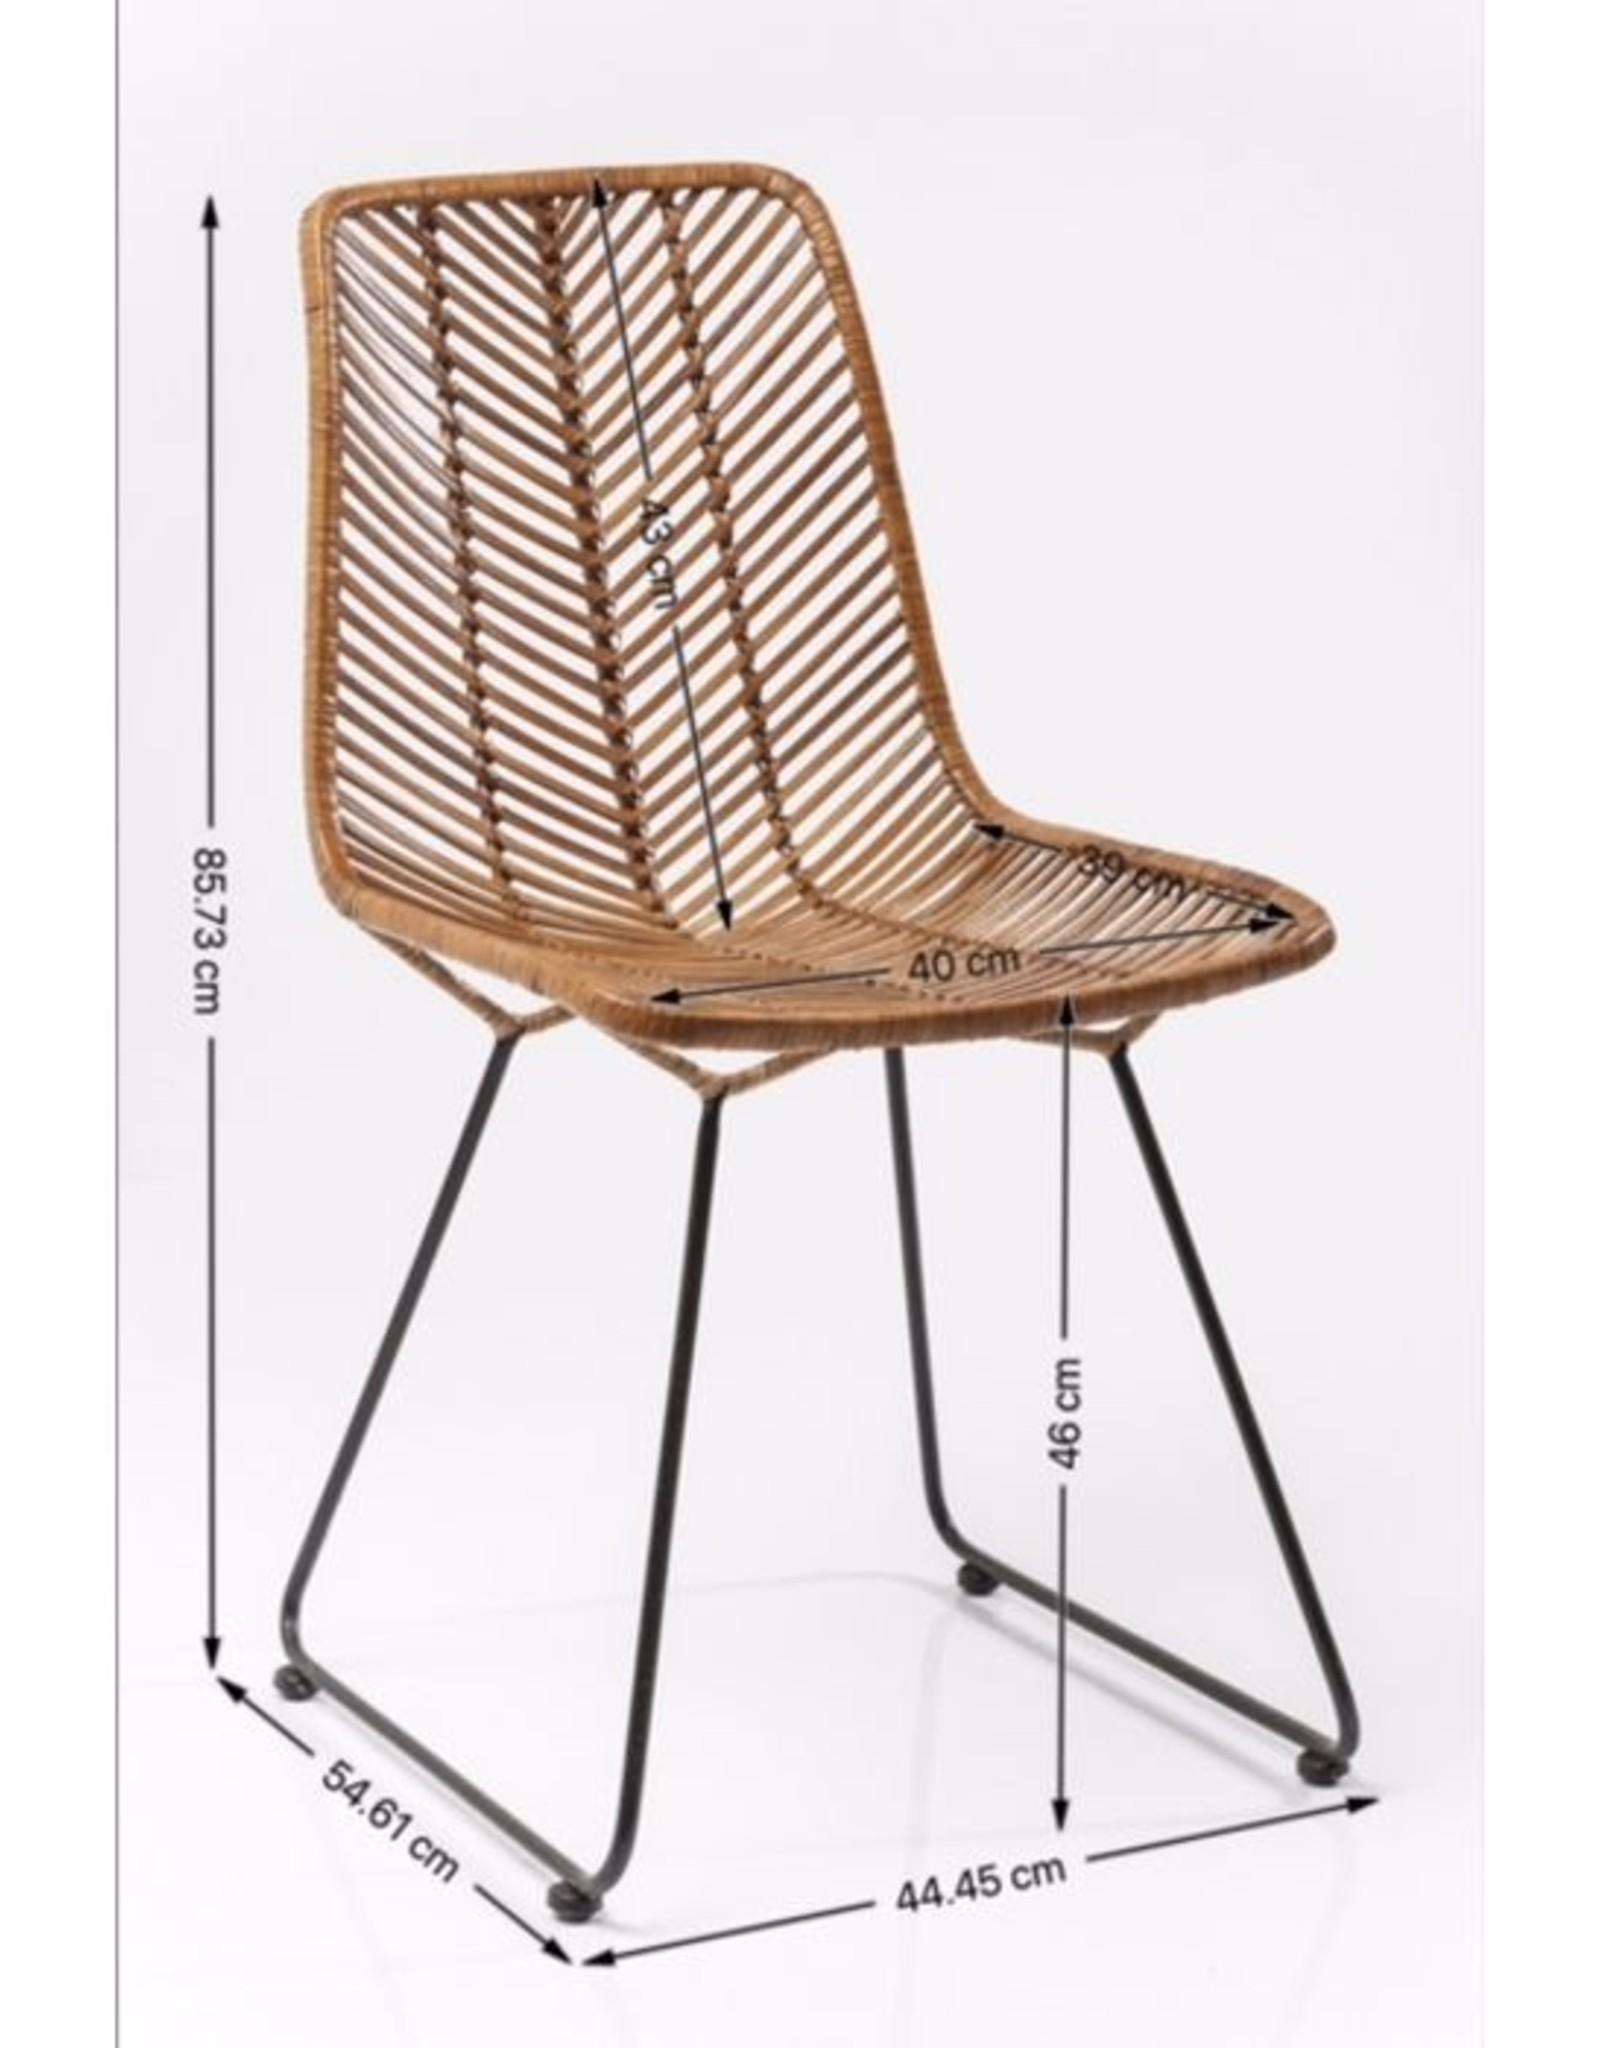 KARE DESIGN Chair Ko Lanta